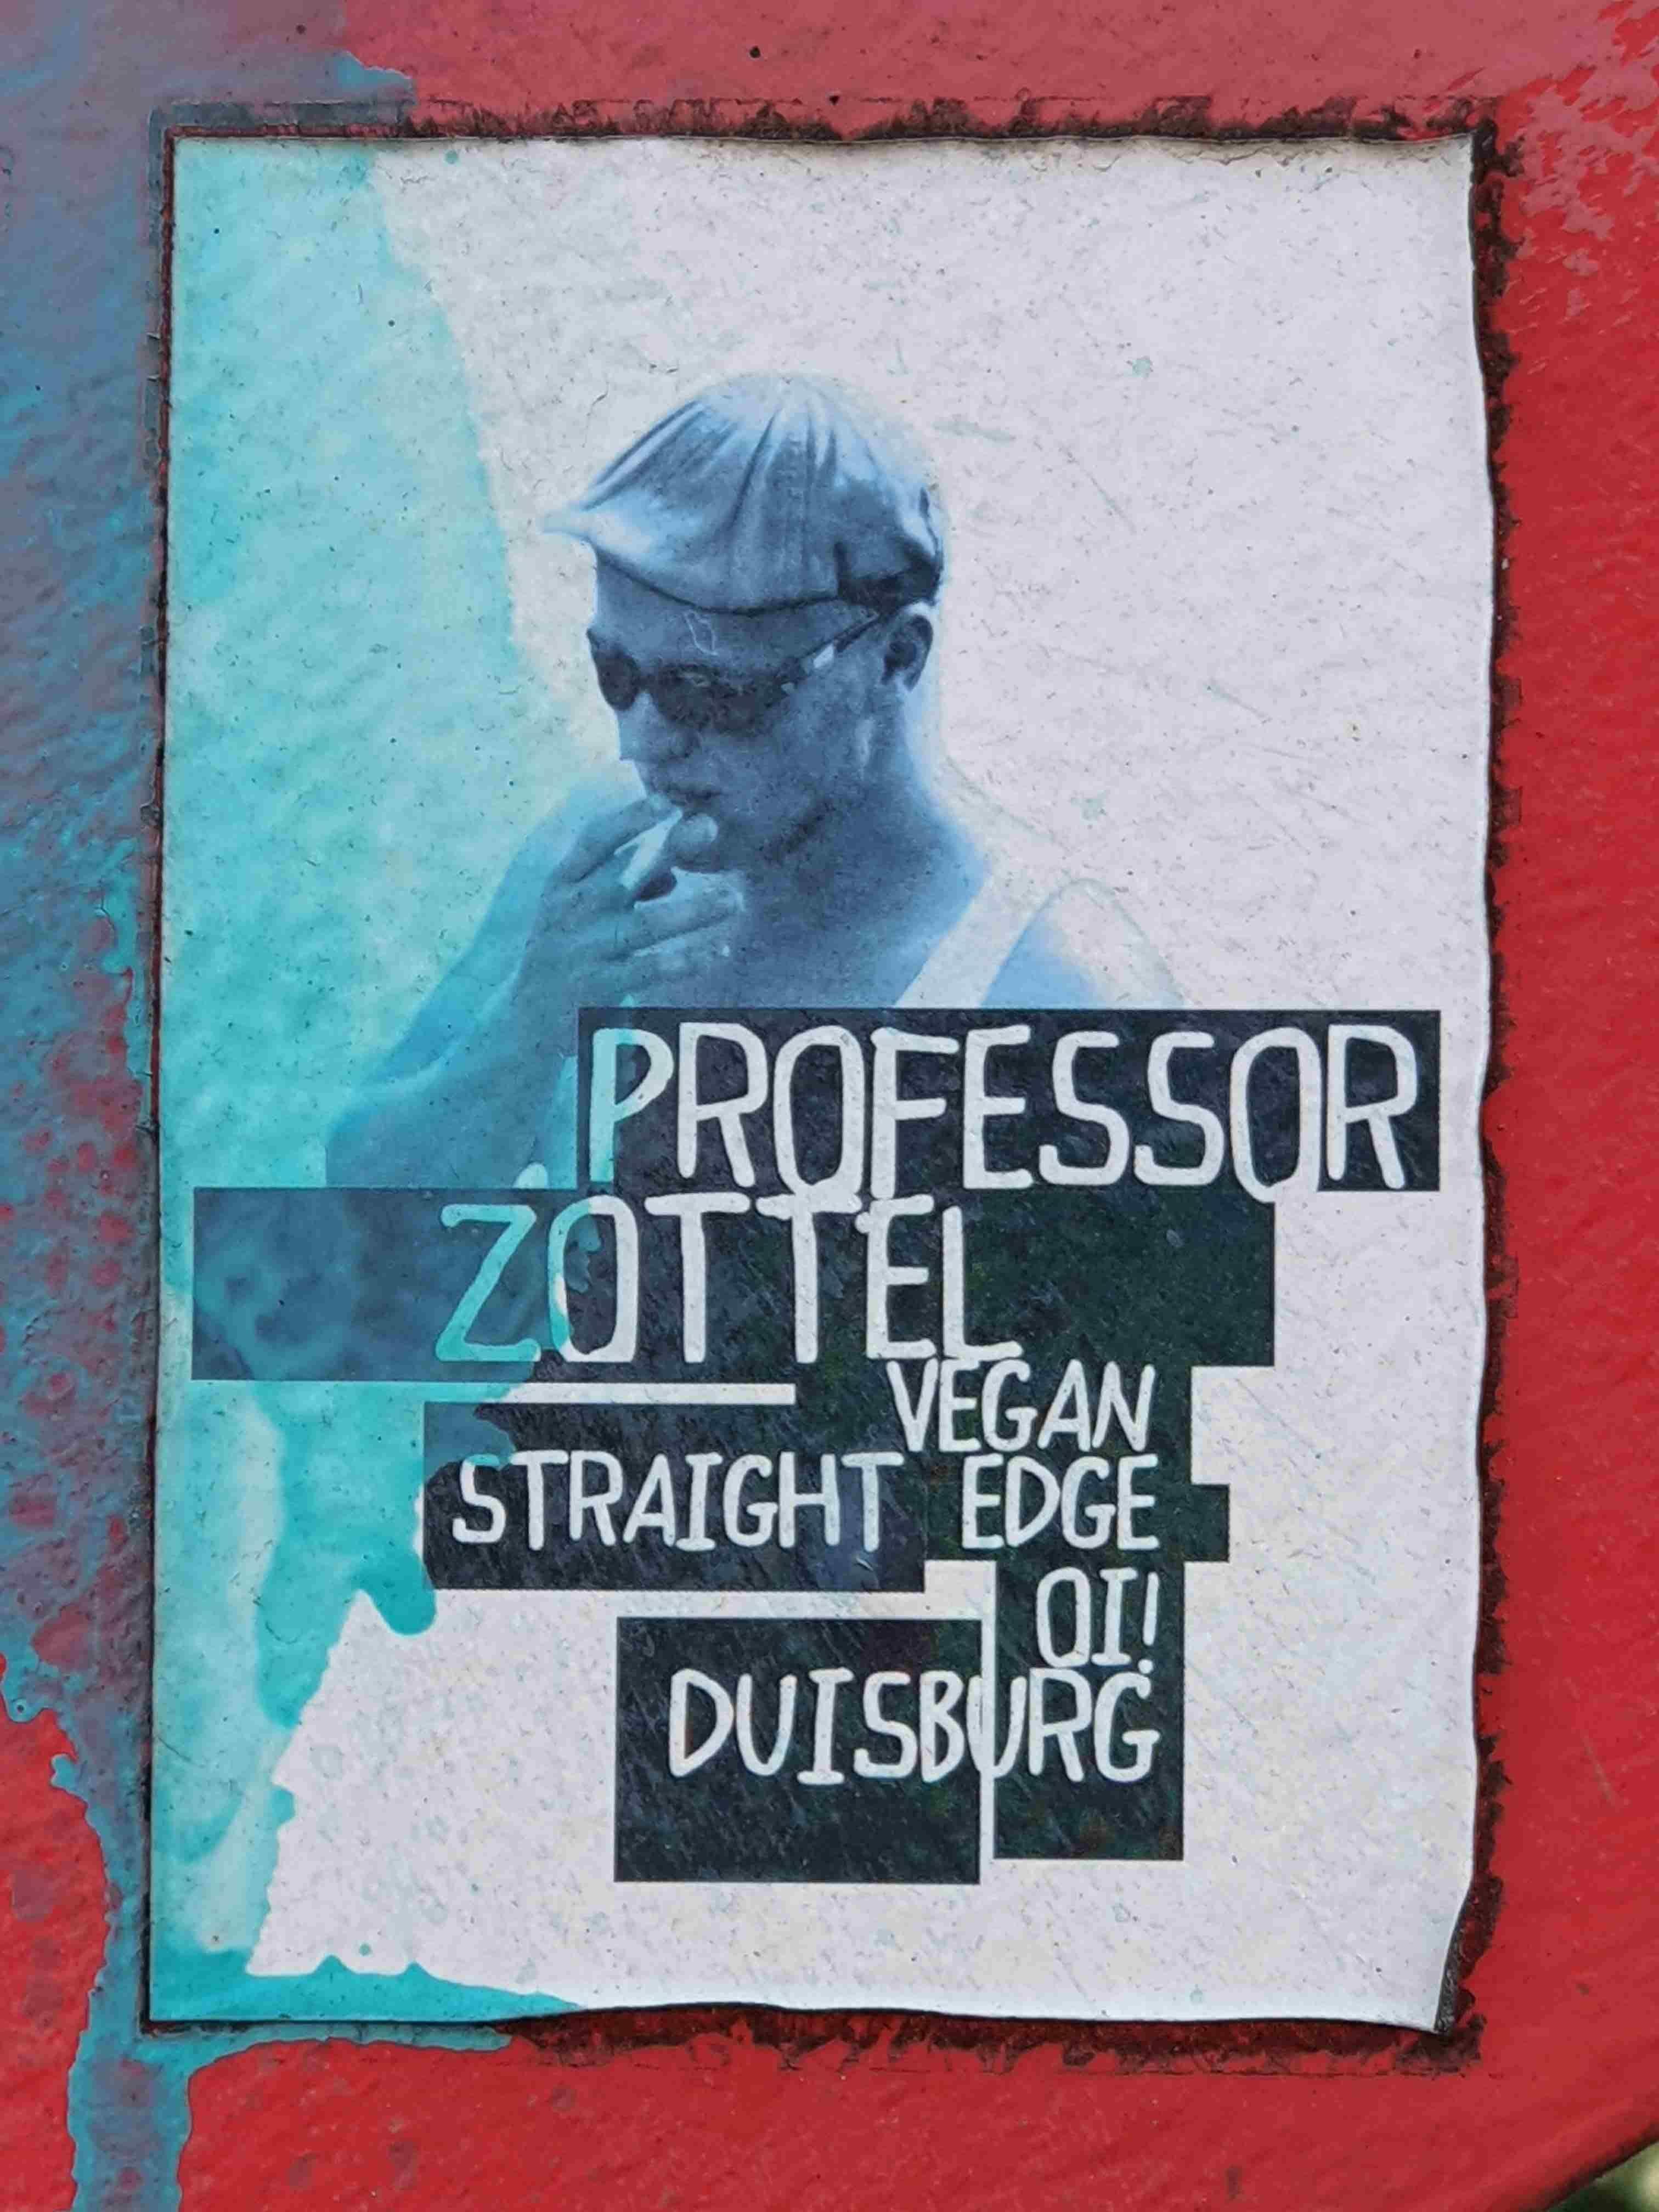 Professor Zottel